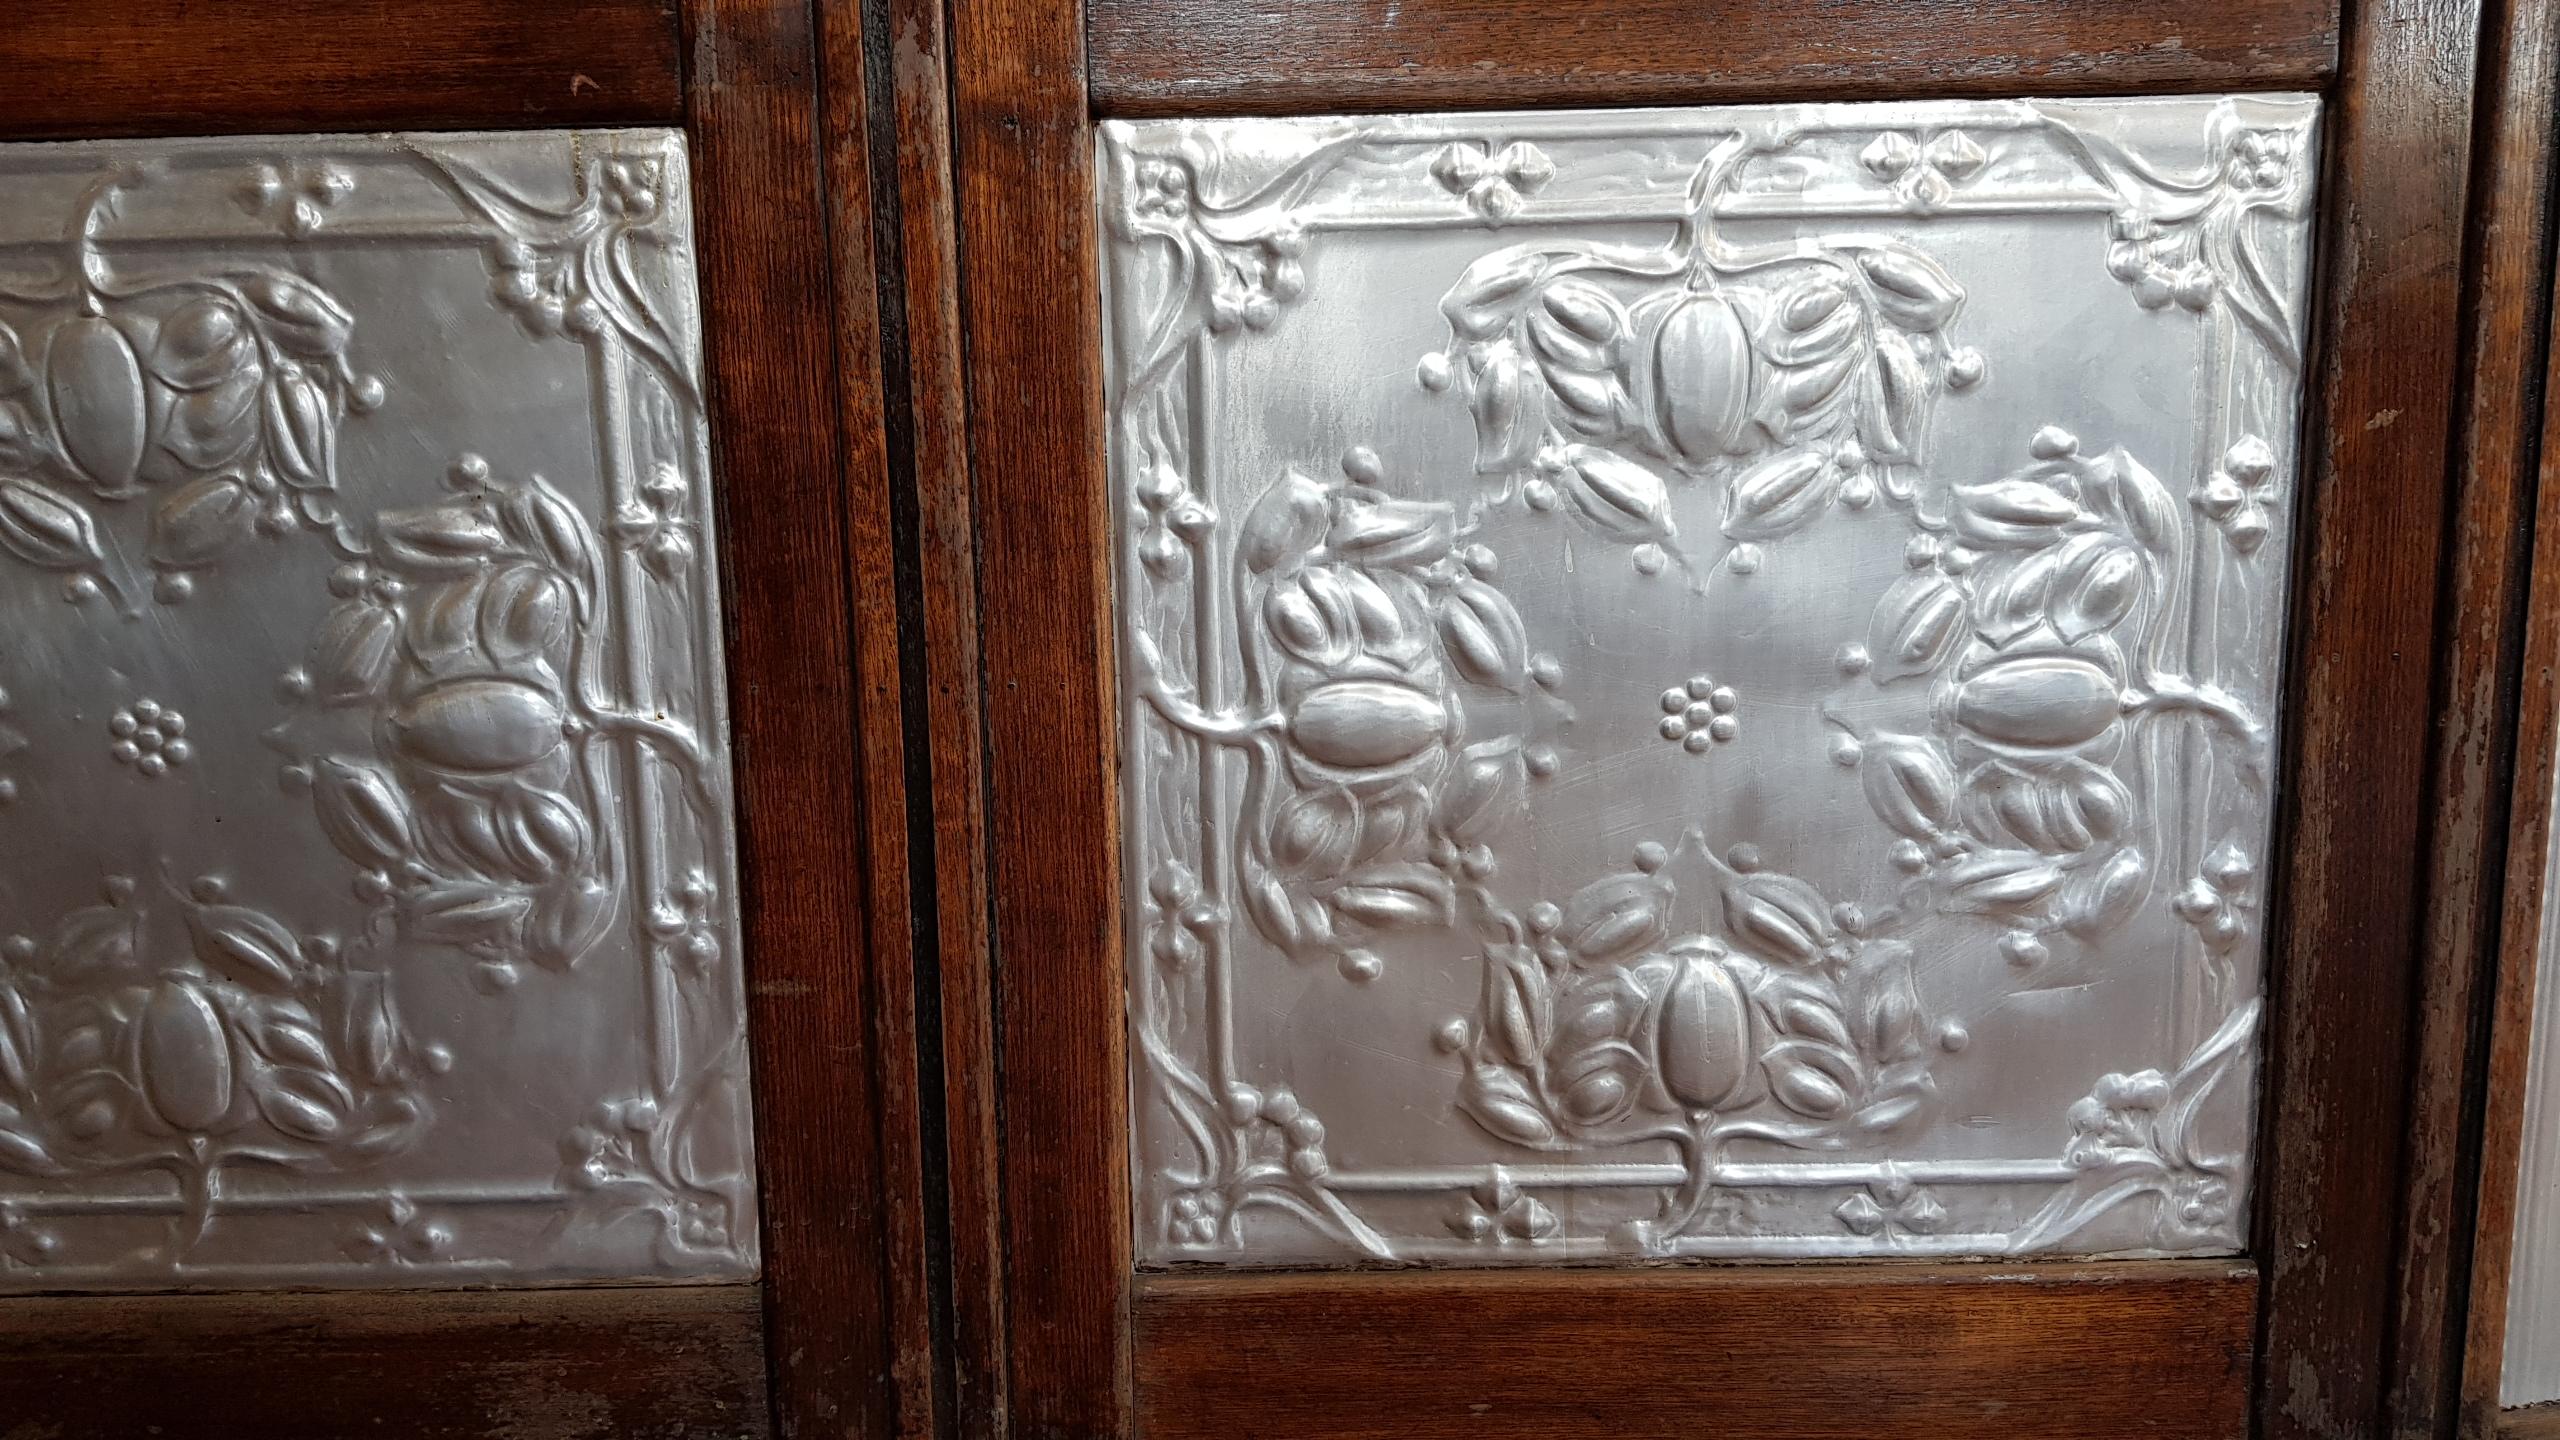 Decorative Pressed Tin Panels We Admired